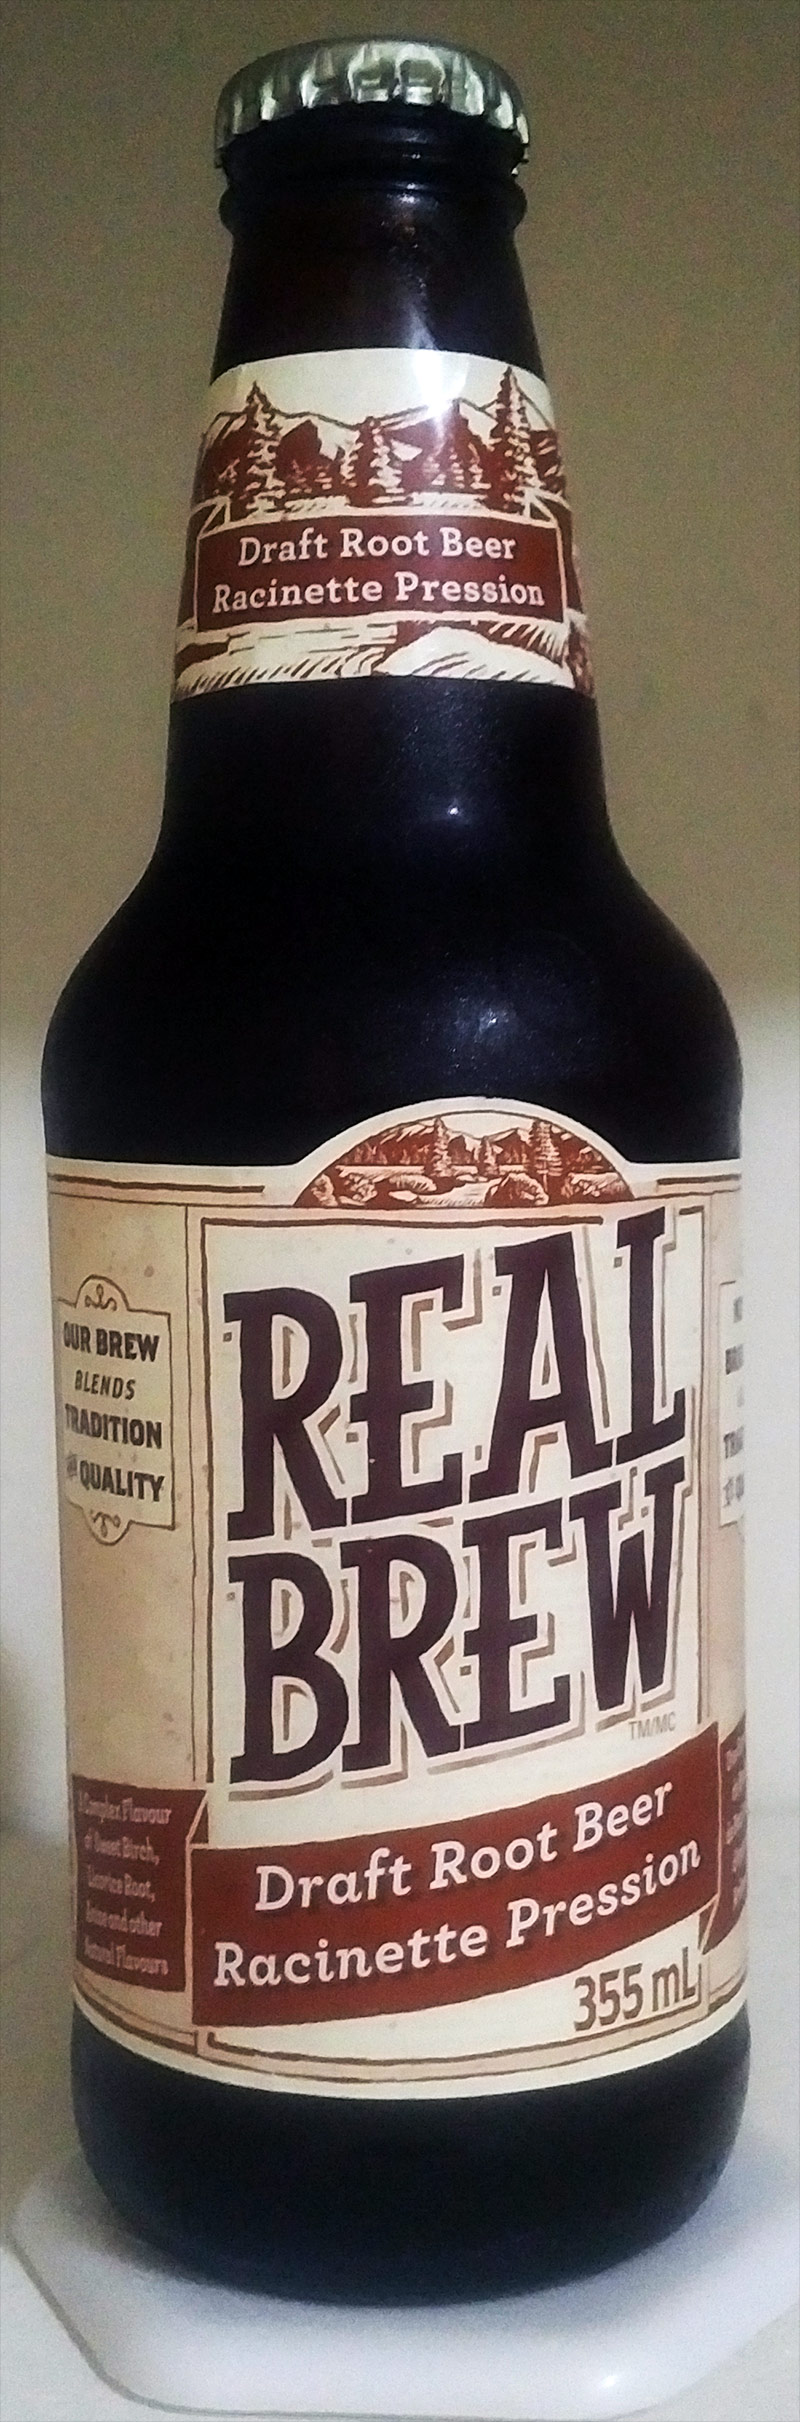 Smucker's Real Brew Draft Root Beer